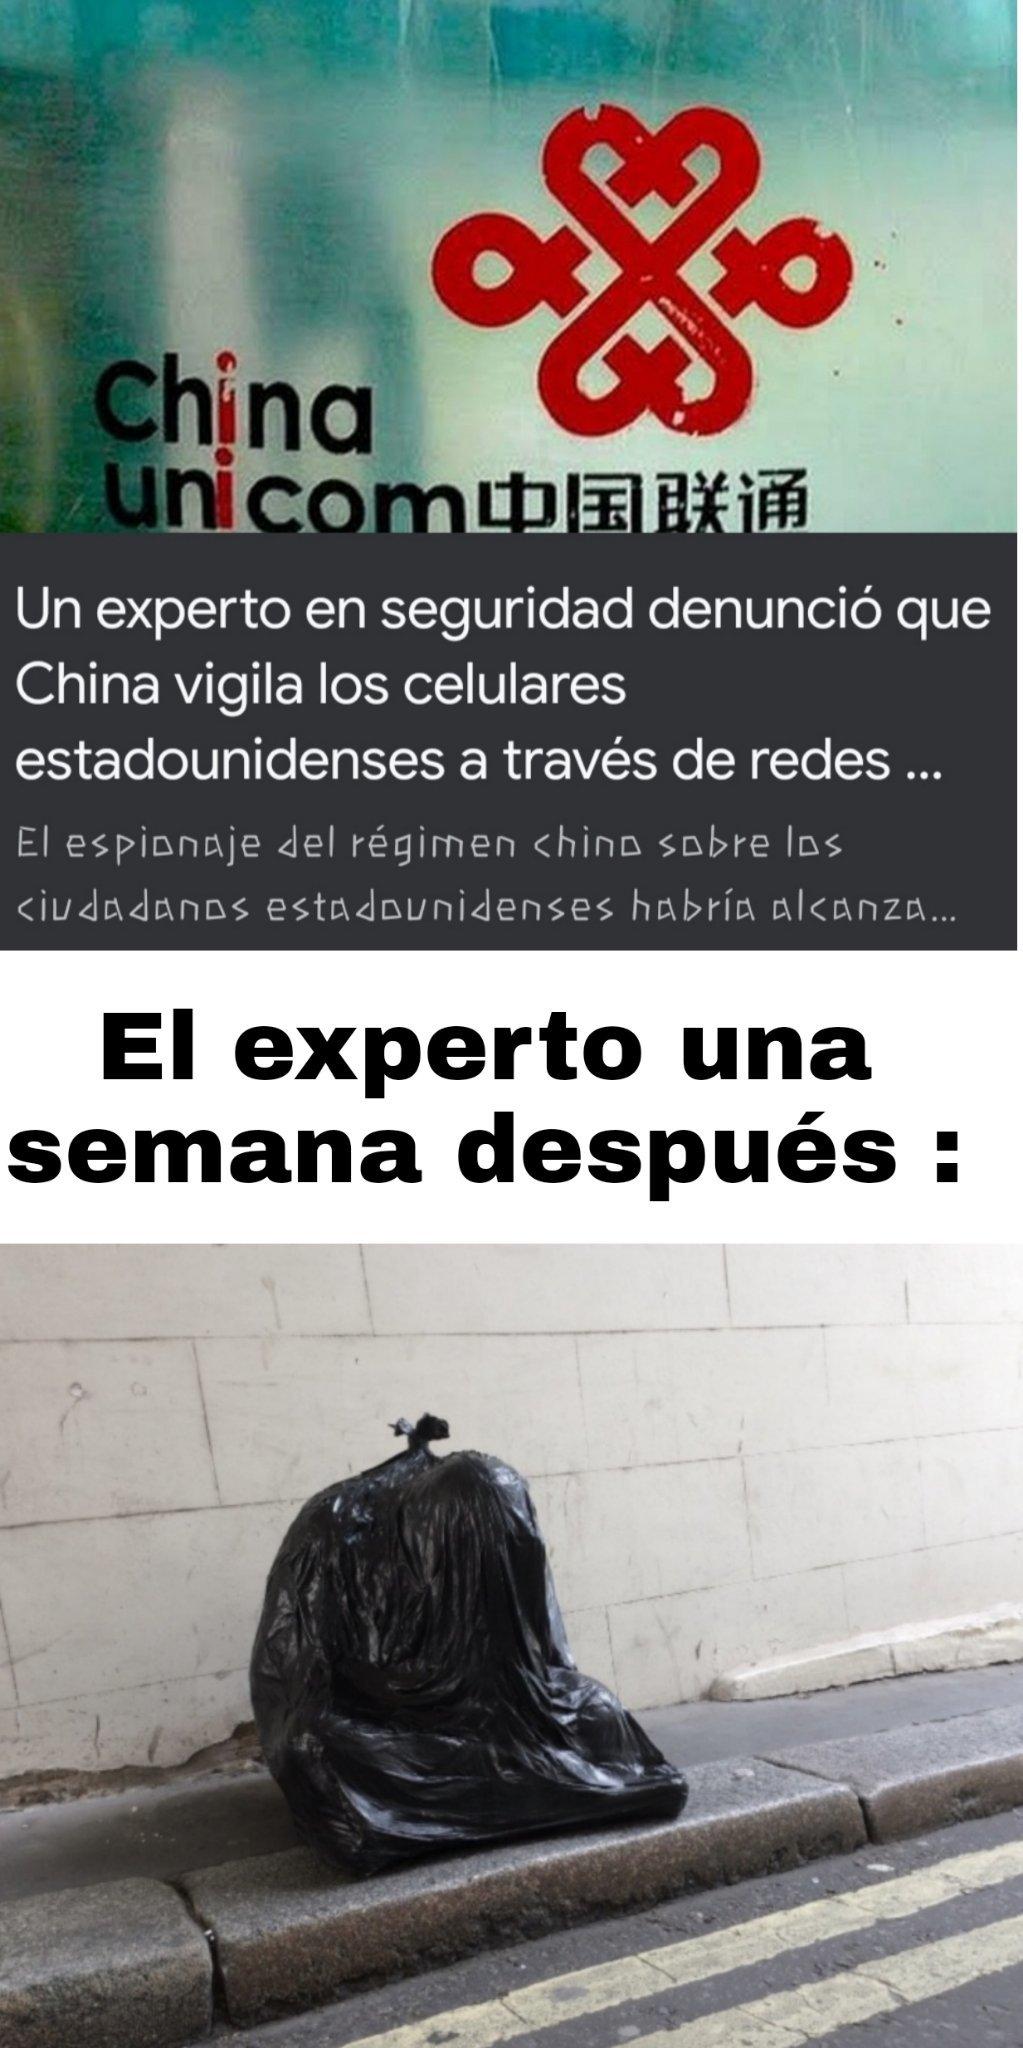 China socialista - meme